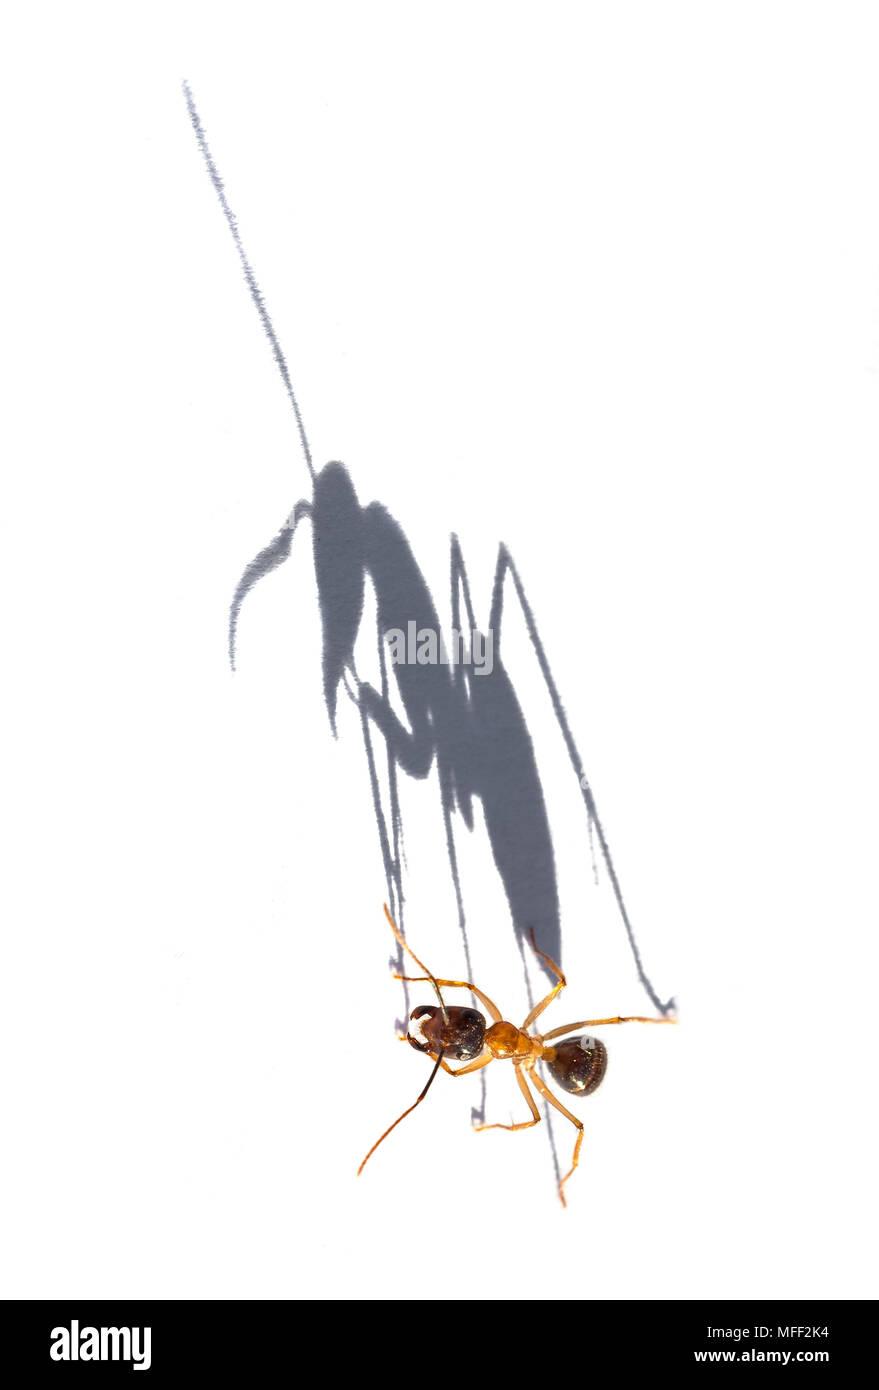 Sugar Ant (Camponotus spp.), Fam. Hymenoptera, shadow on white paper at sunrise, Mulyangarie Station, South Australia, Australia - Stock Image